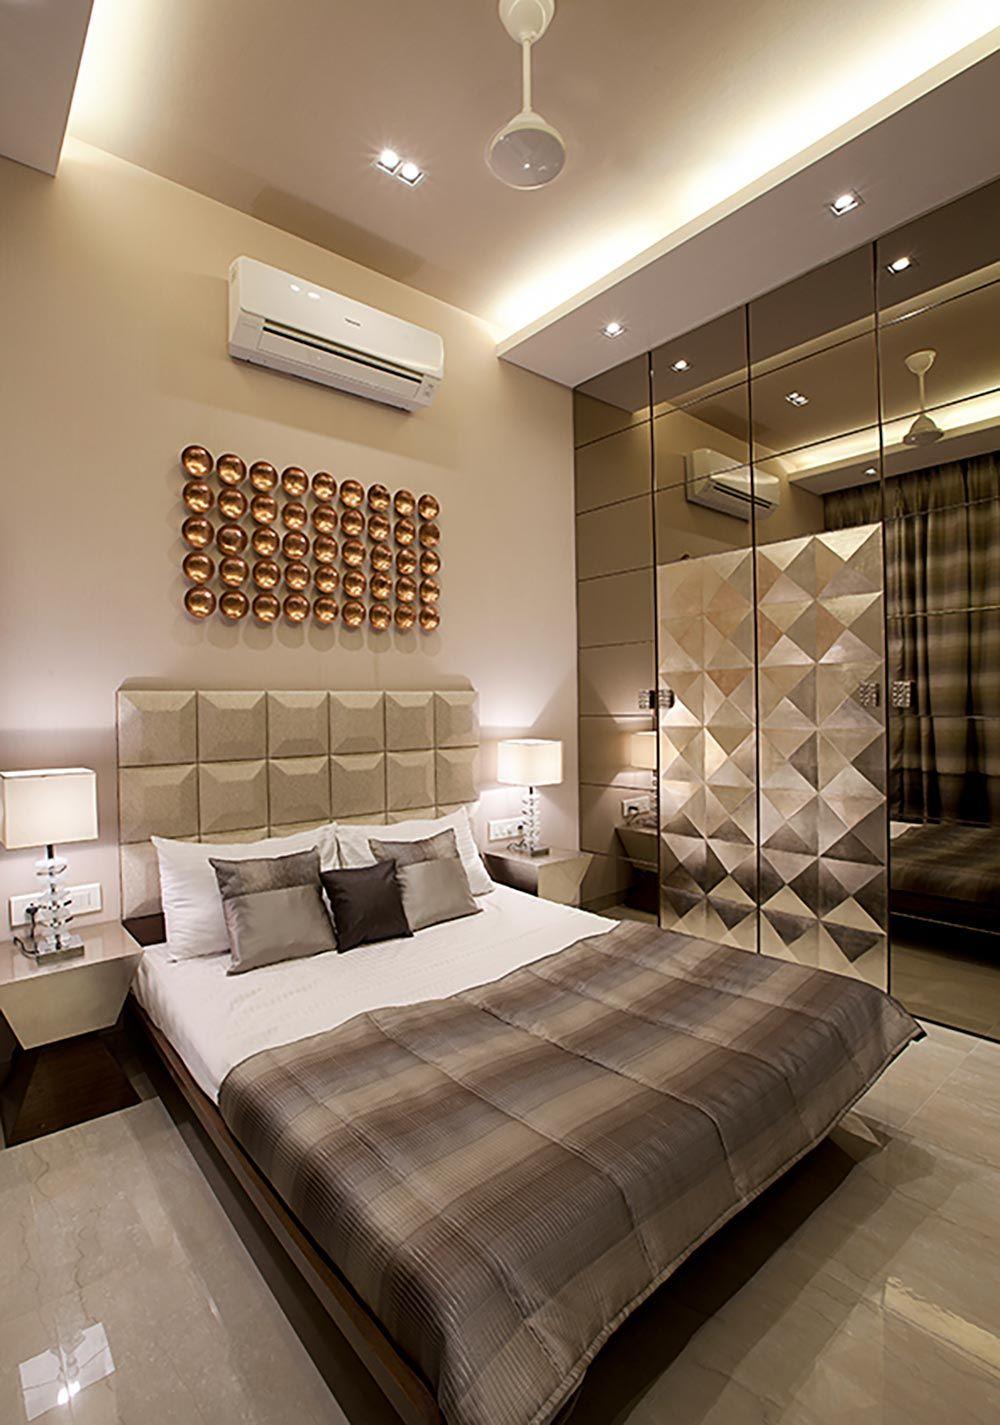 elegant bedroom interior design Elegant Interior Designs - Pinterest: Crackpot Baby